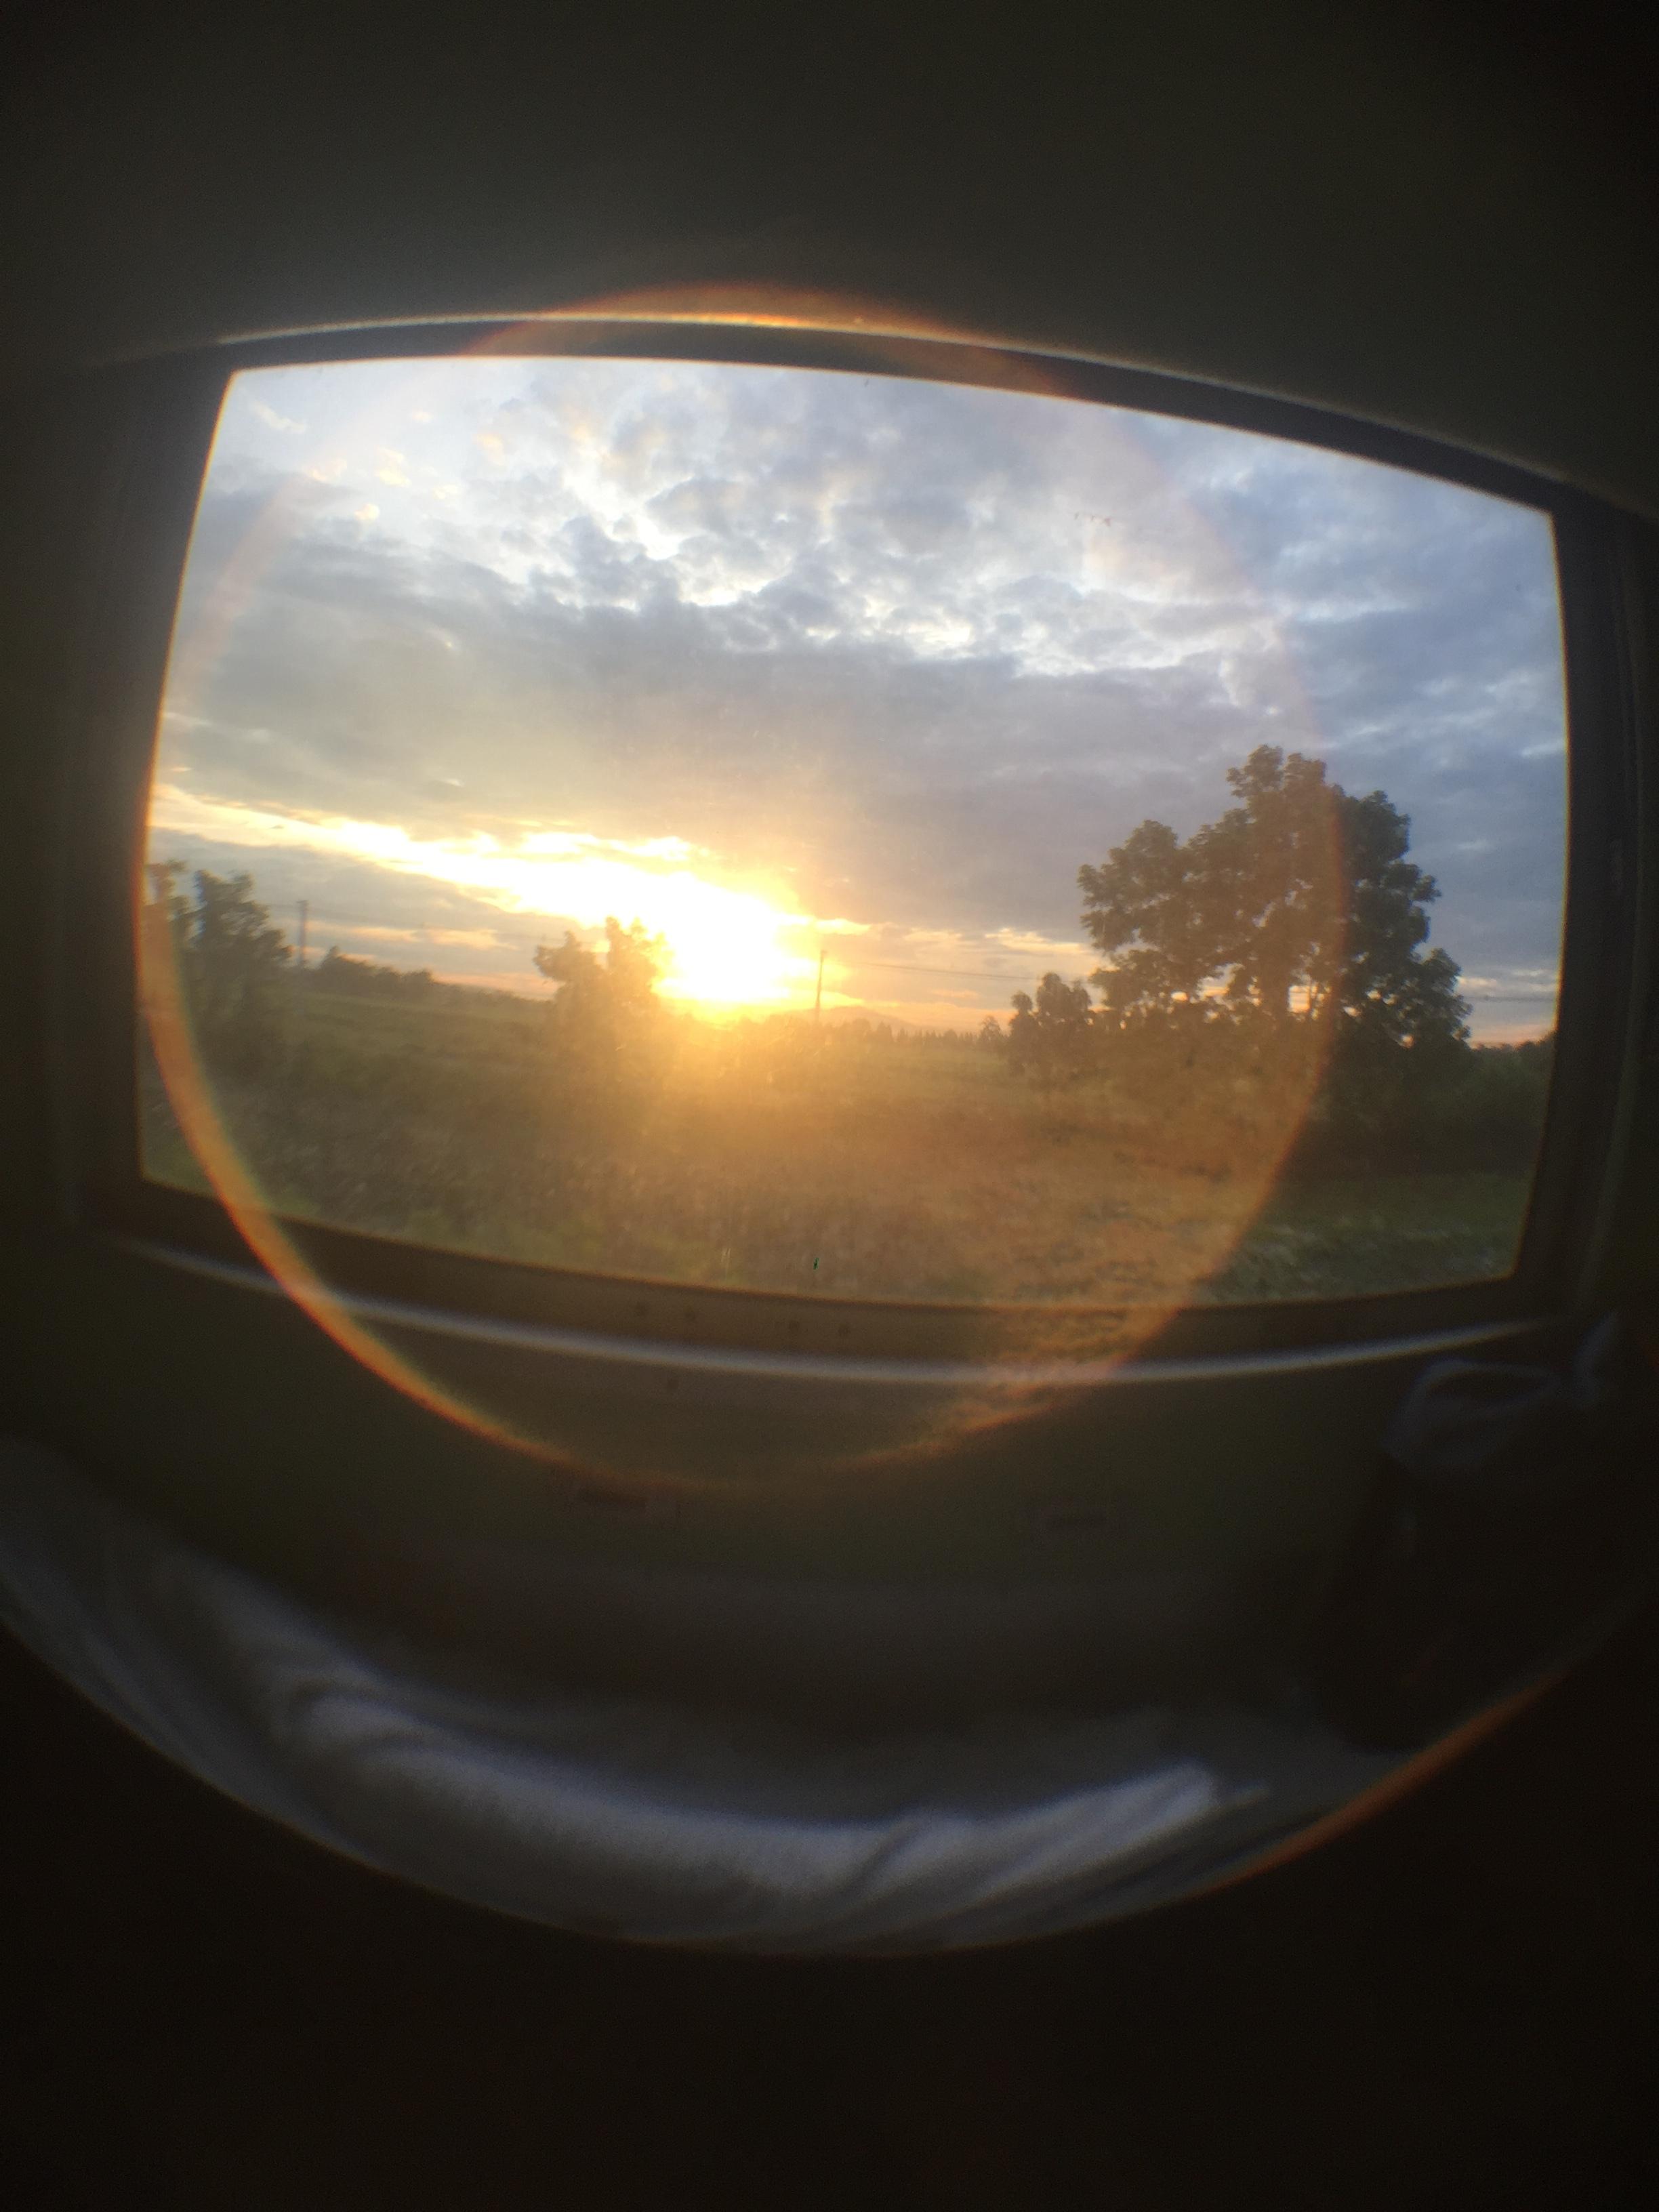 Sunrise from the sleeper train.